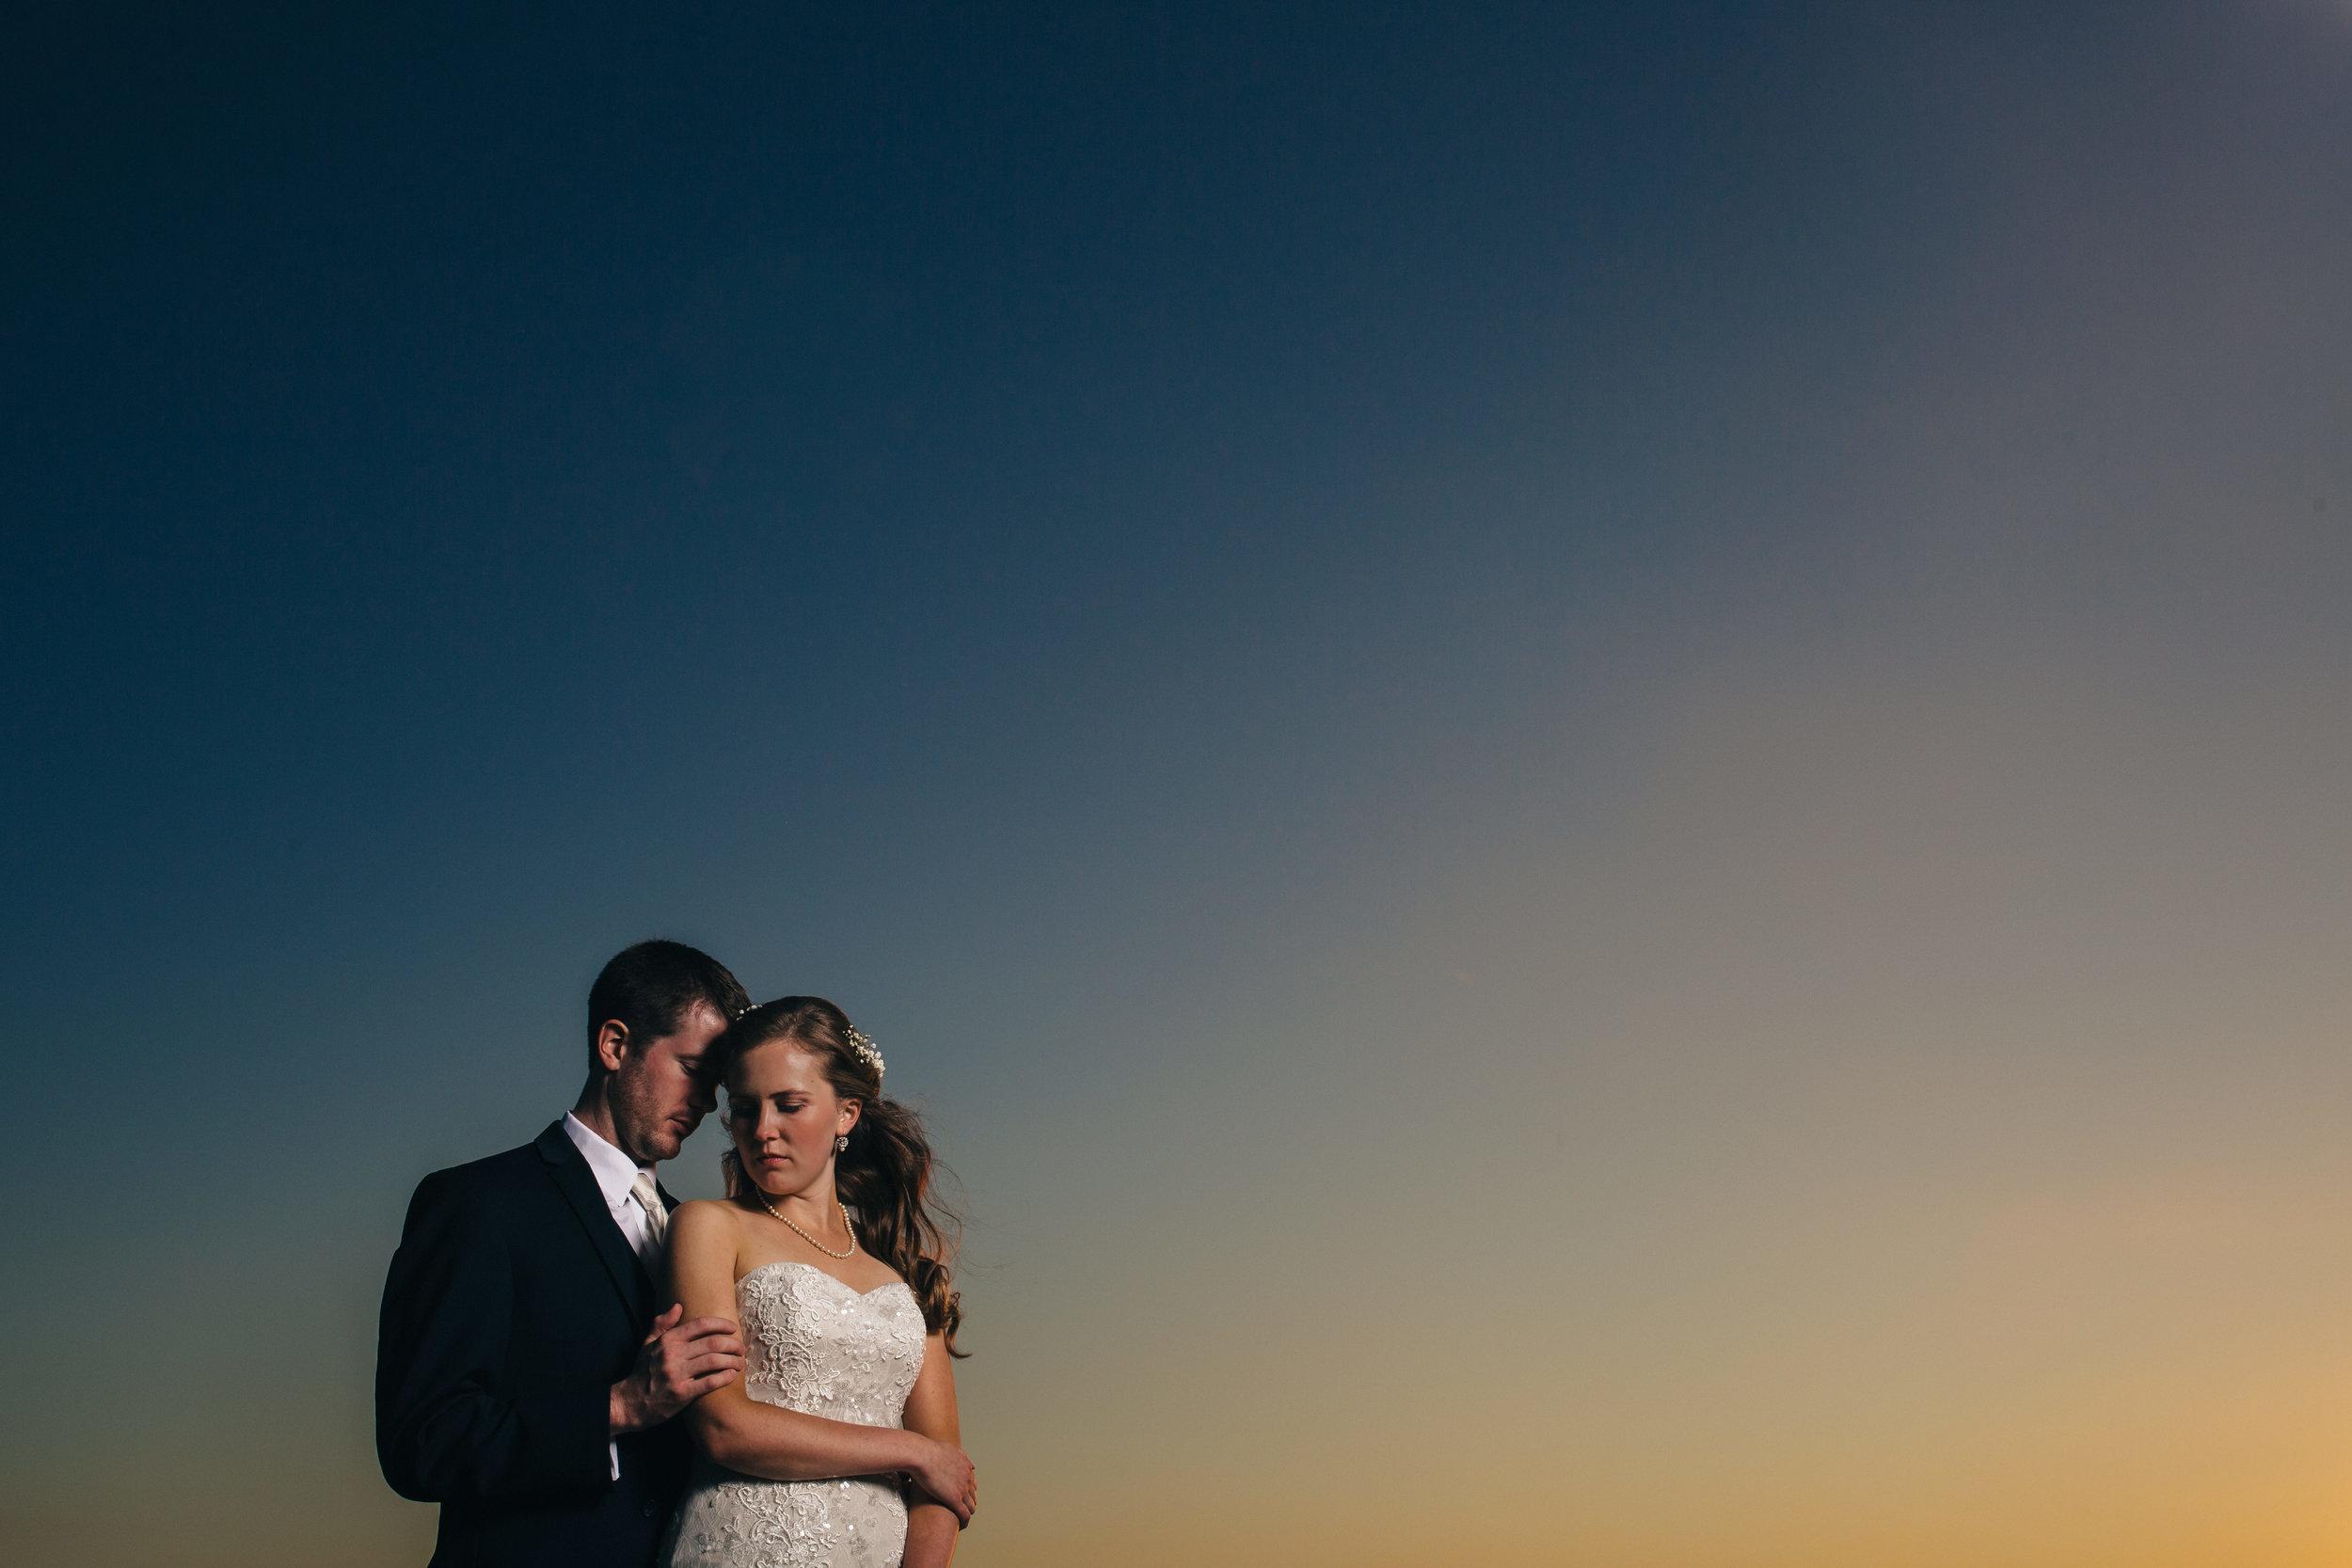 Sunset wedding photography at Stone Ridge Golf Club in Bowling Green, Ohio.